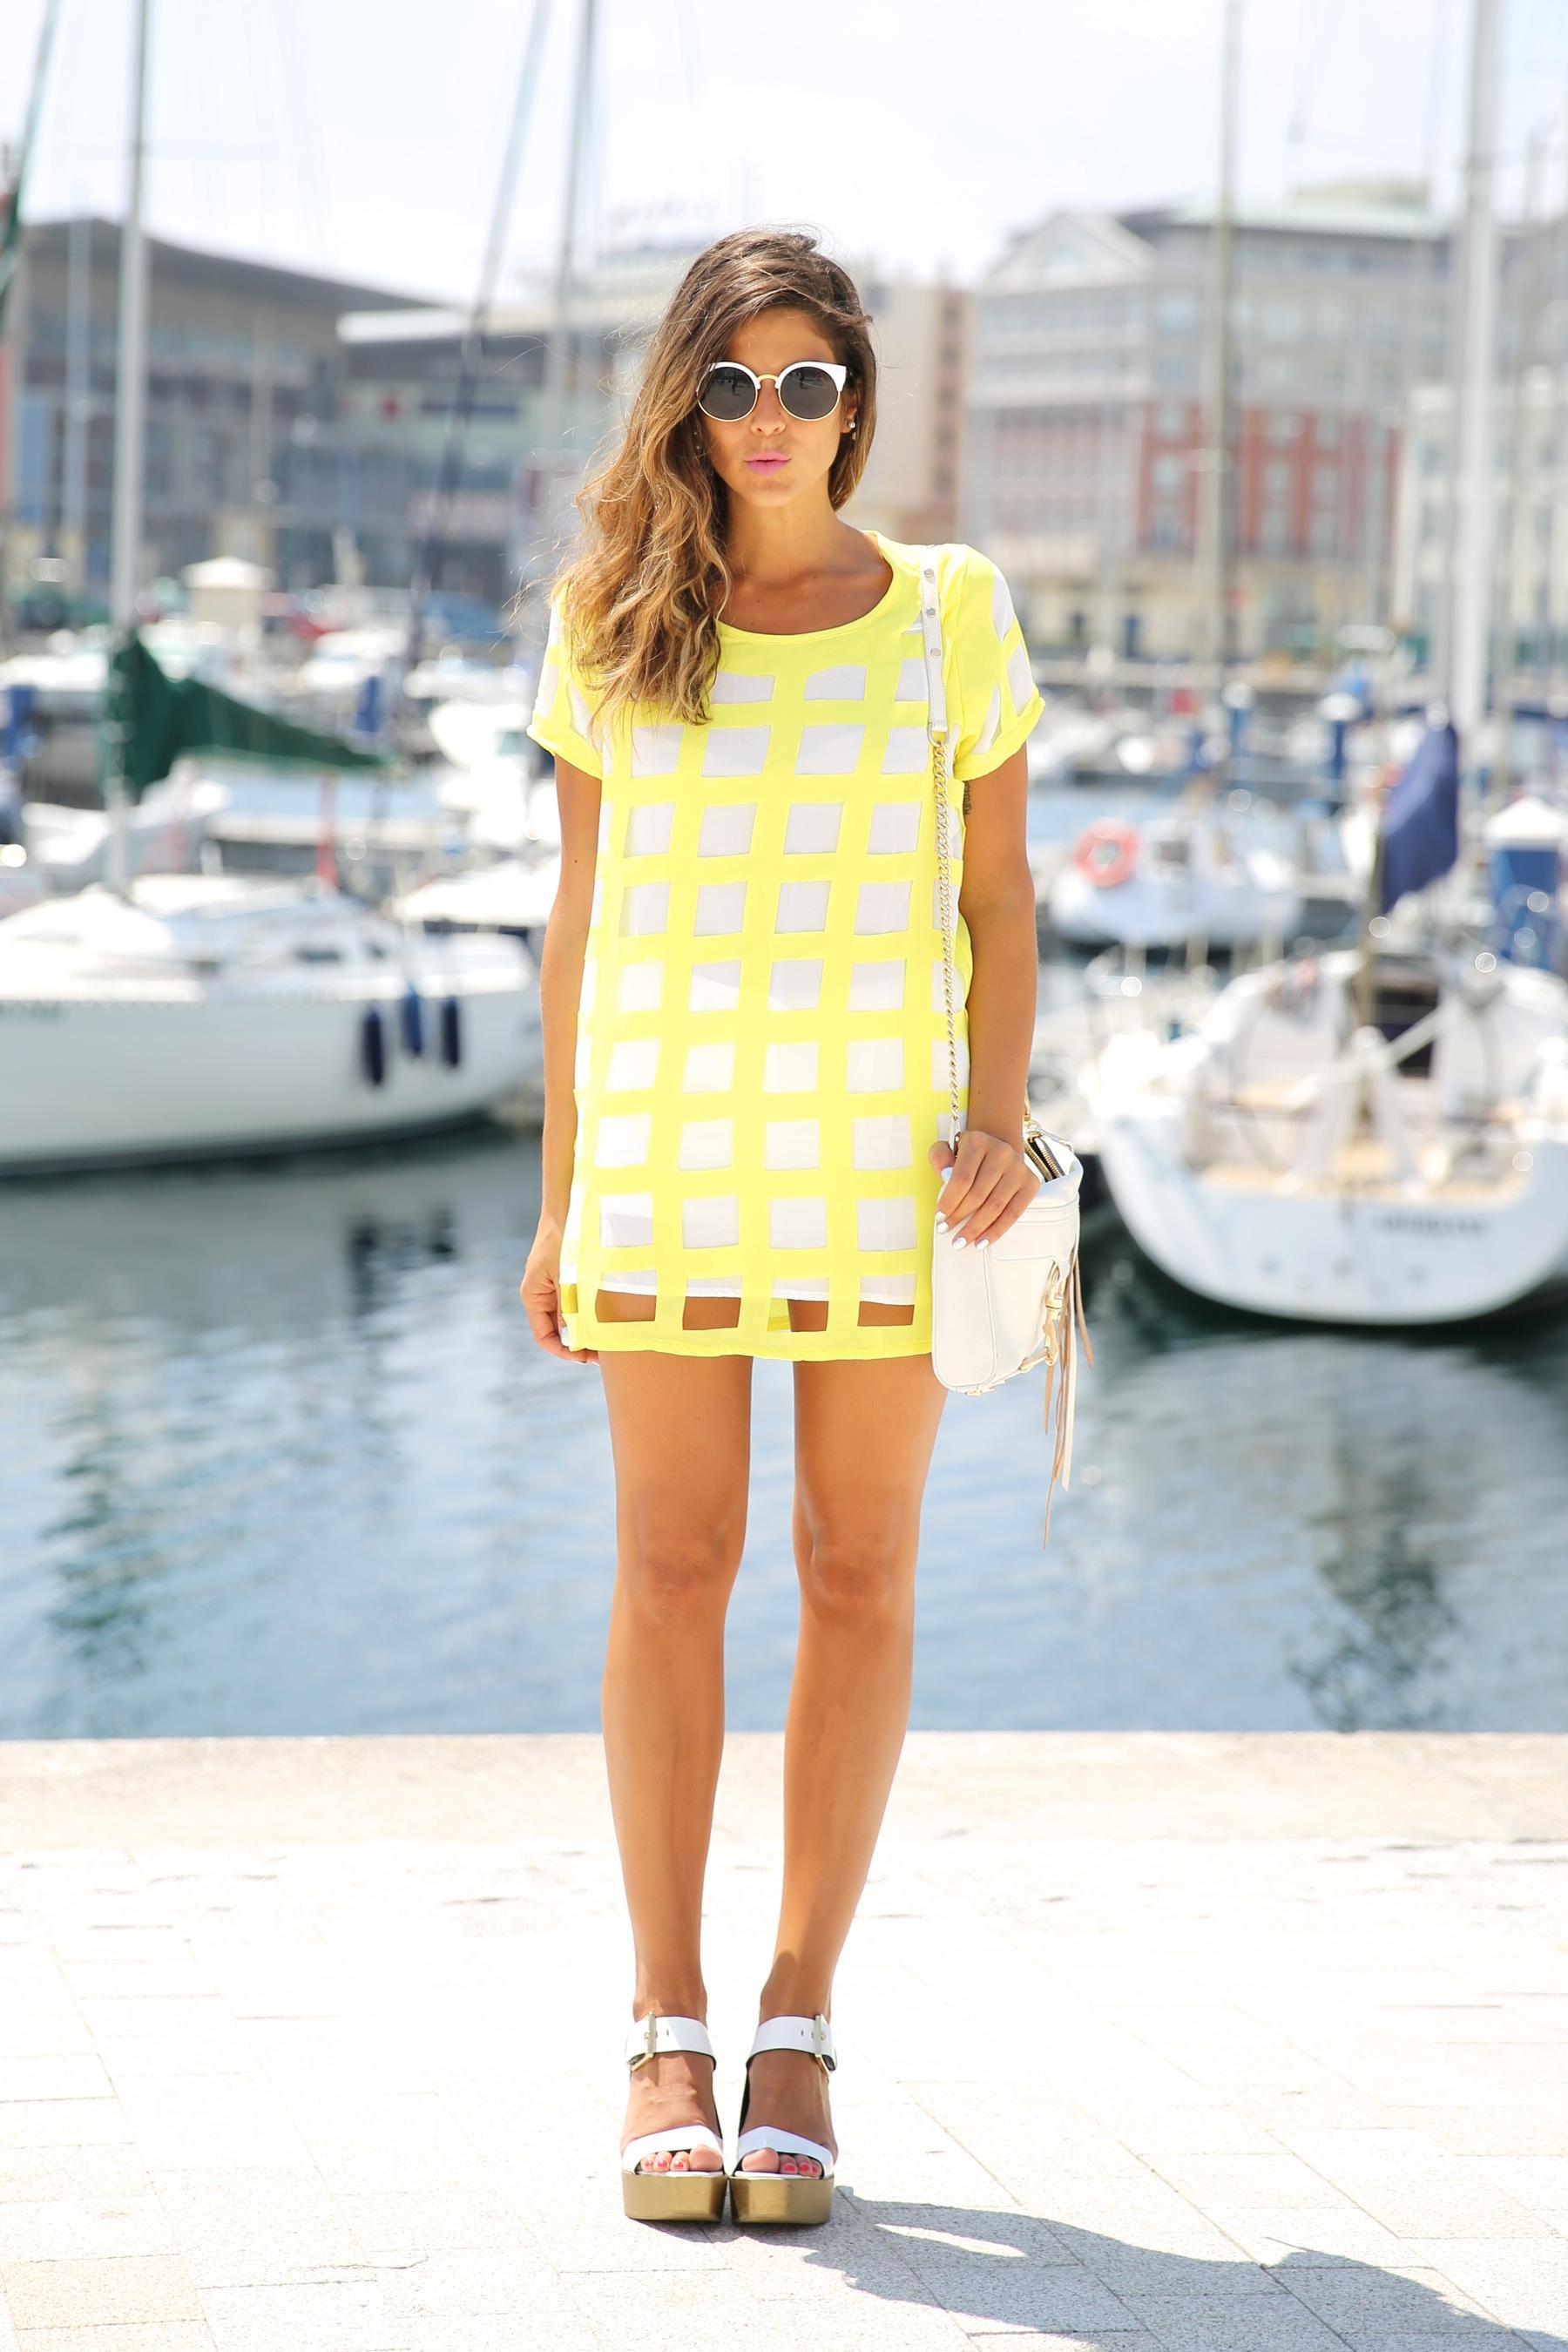 trendy_taste-look-outfit-street_style-ootd-blog-blogger-moda_españa-fashion_spain-coruña-galicia-sandalias_plataforma-platform_sandals-rebecca_minkoff-yellow-amarillo-vestido-dress-plaid-cuadros-8